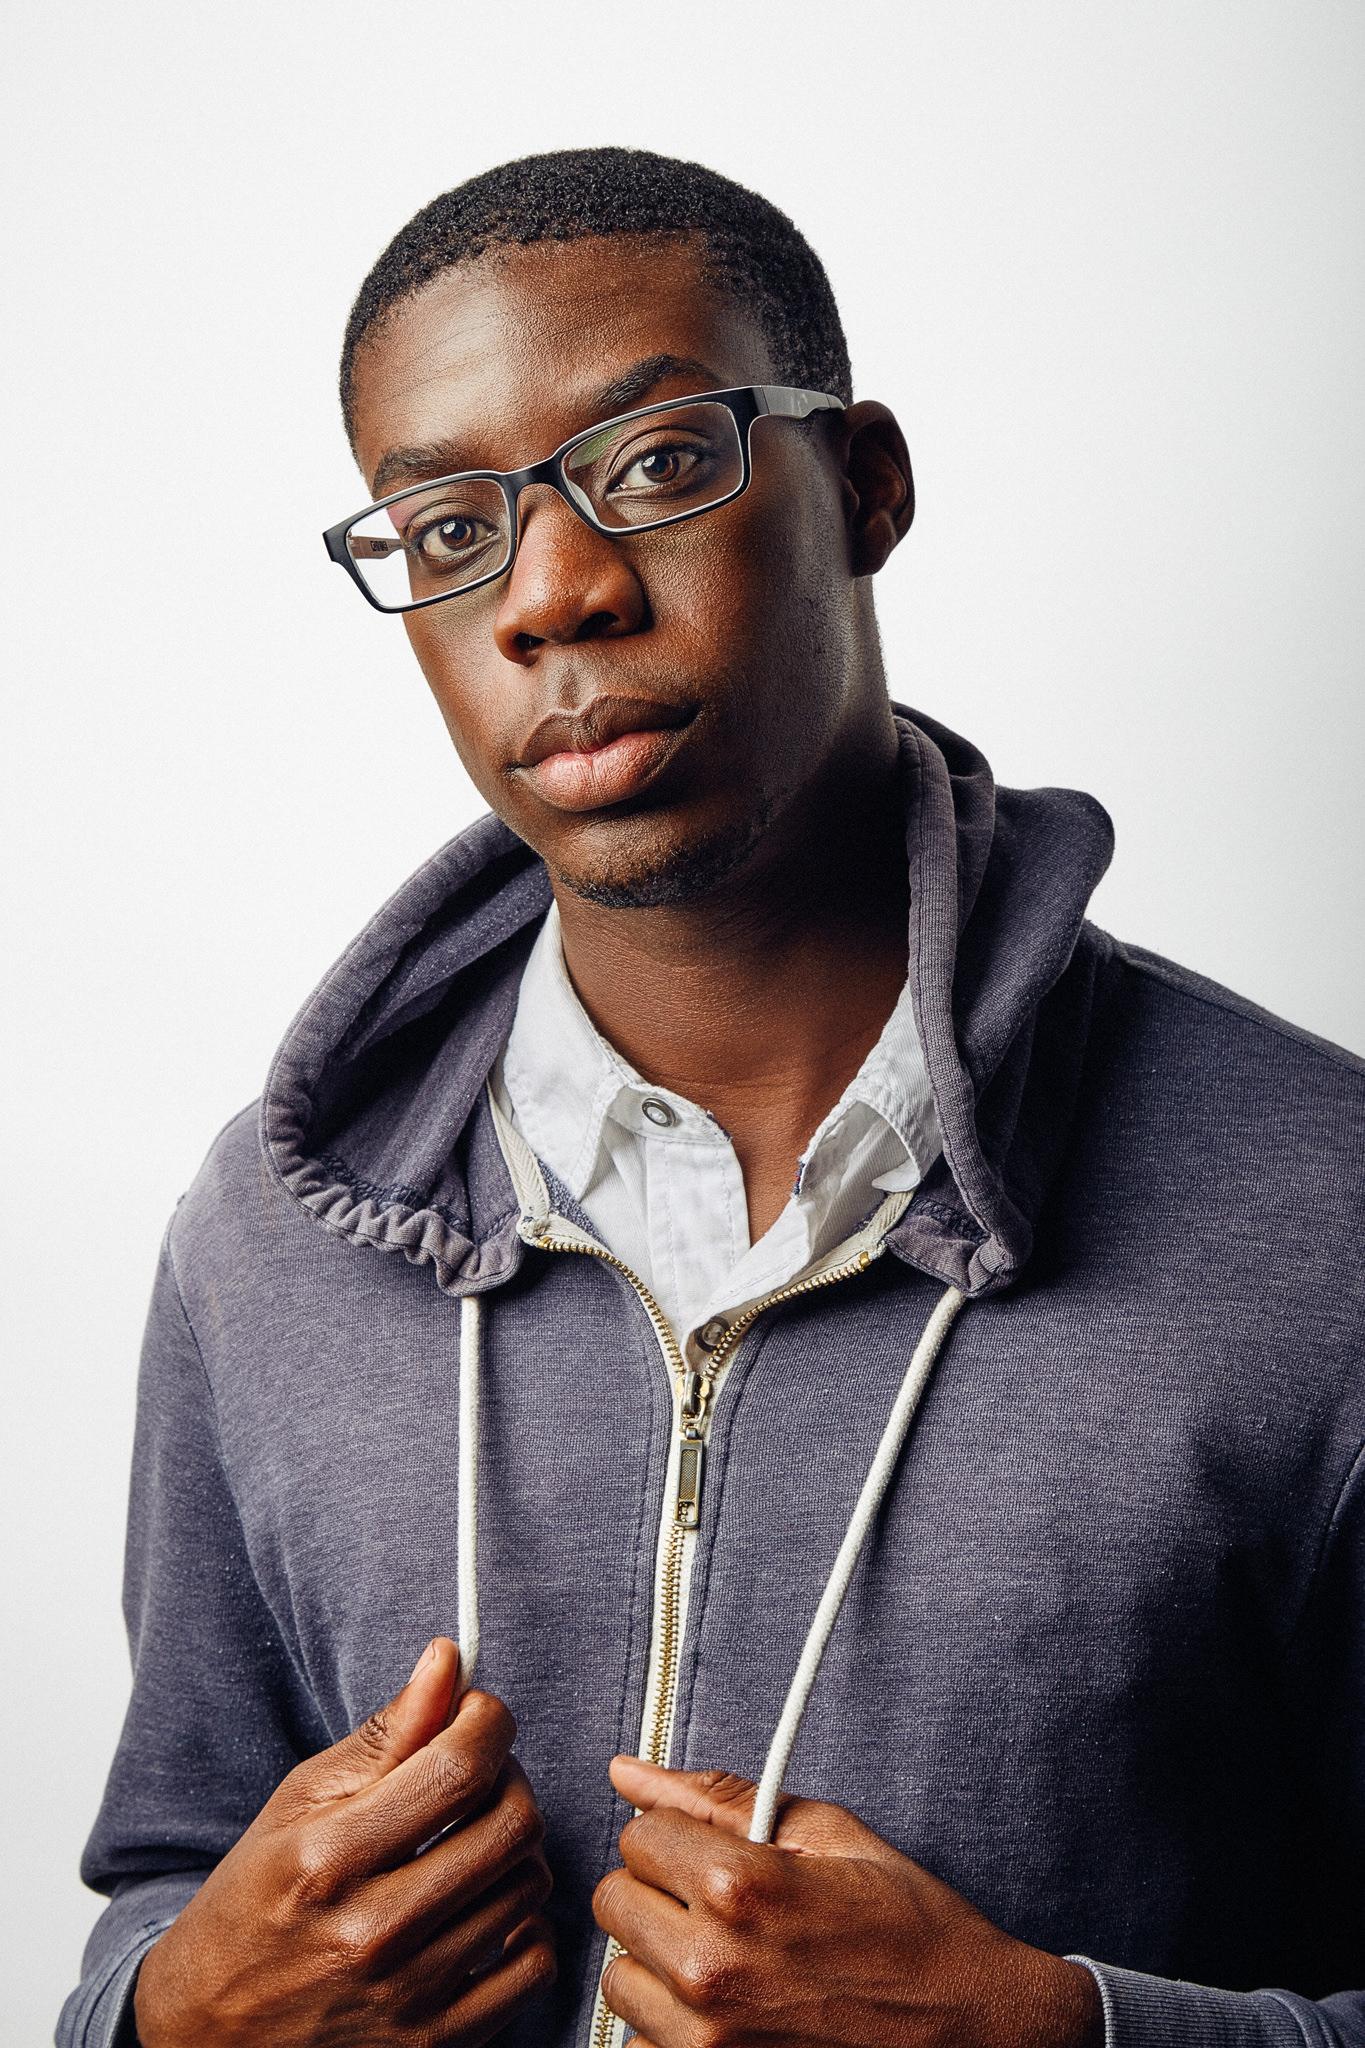 Adult male actor professional headshot on white background.